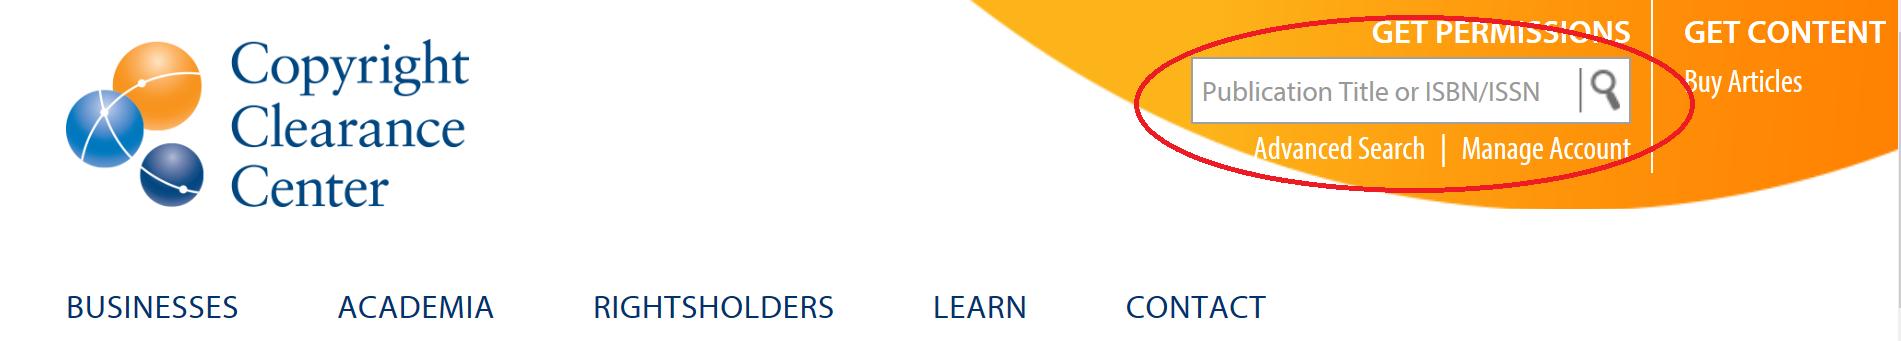 Screenshot of Copyright Clearance Center website search bar